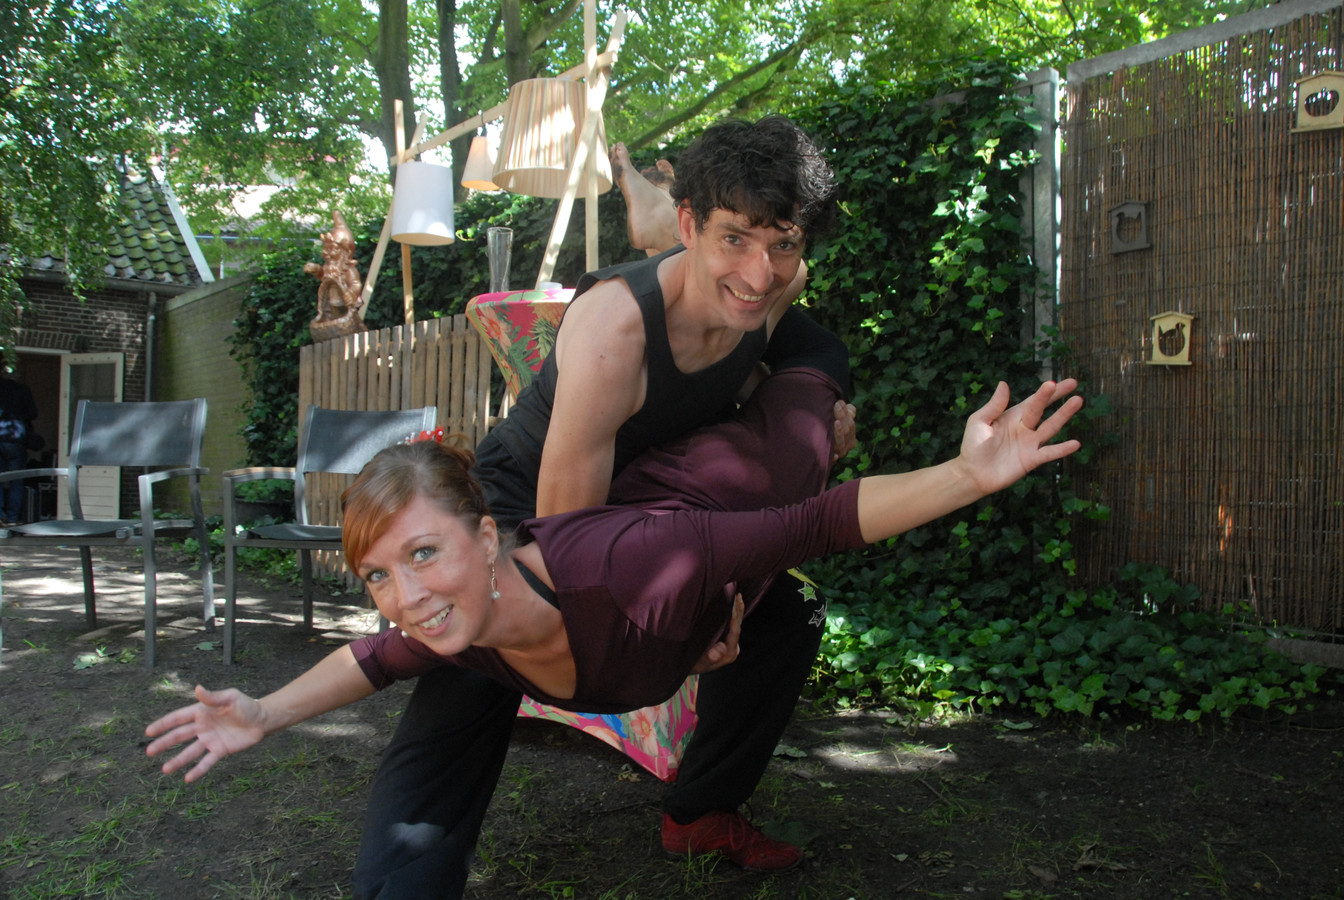 Het dansduo Bernadette Besselink – Jeroen Lammertink